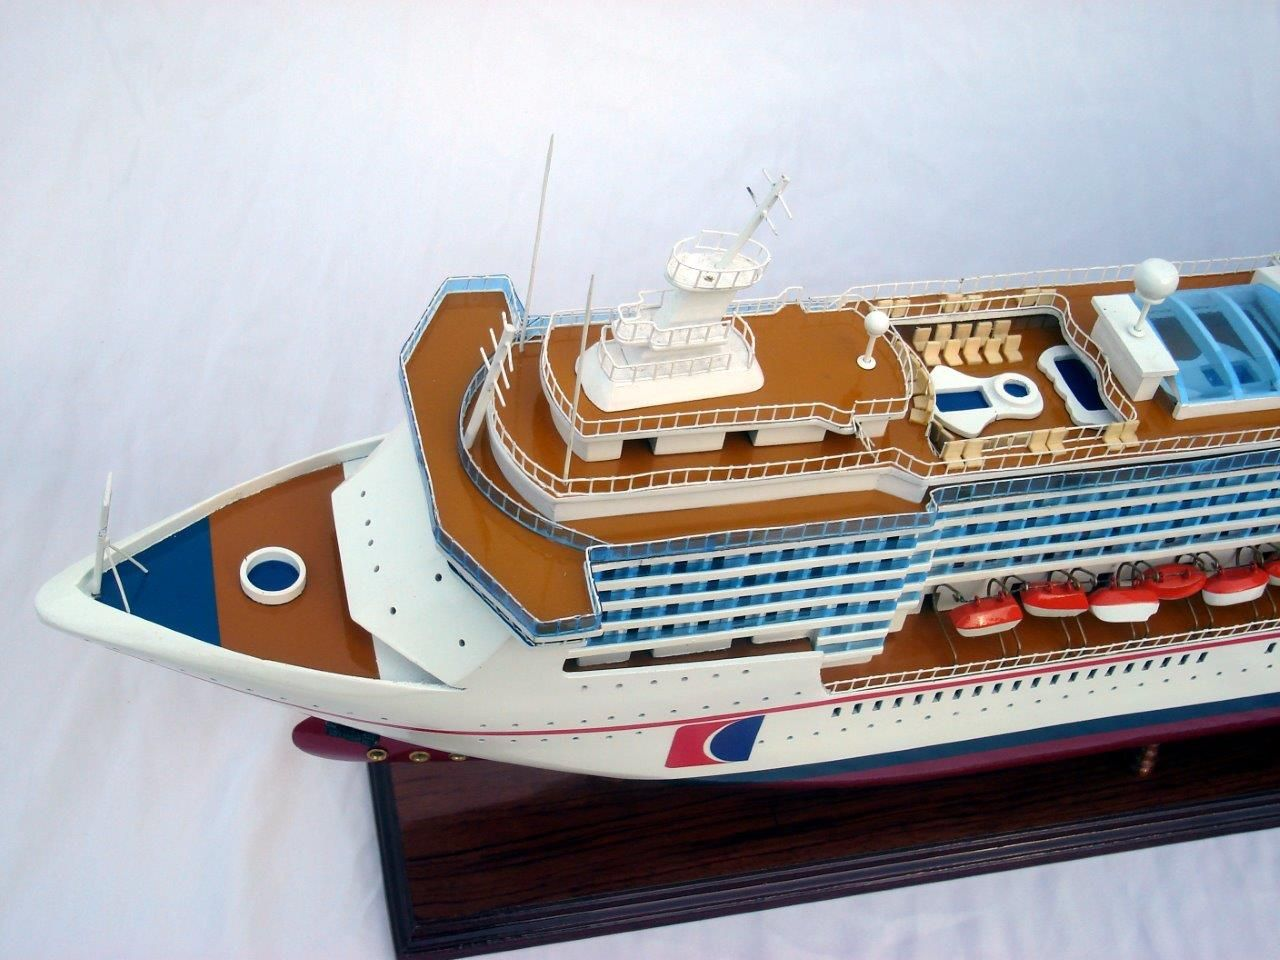 1984-11660-Carnival-MiracleI-model-boat